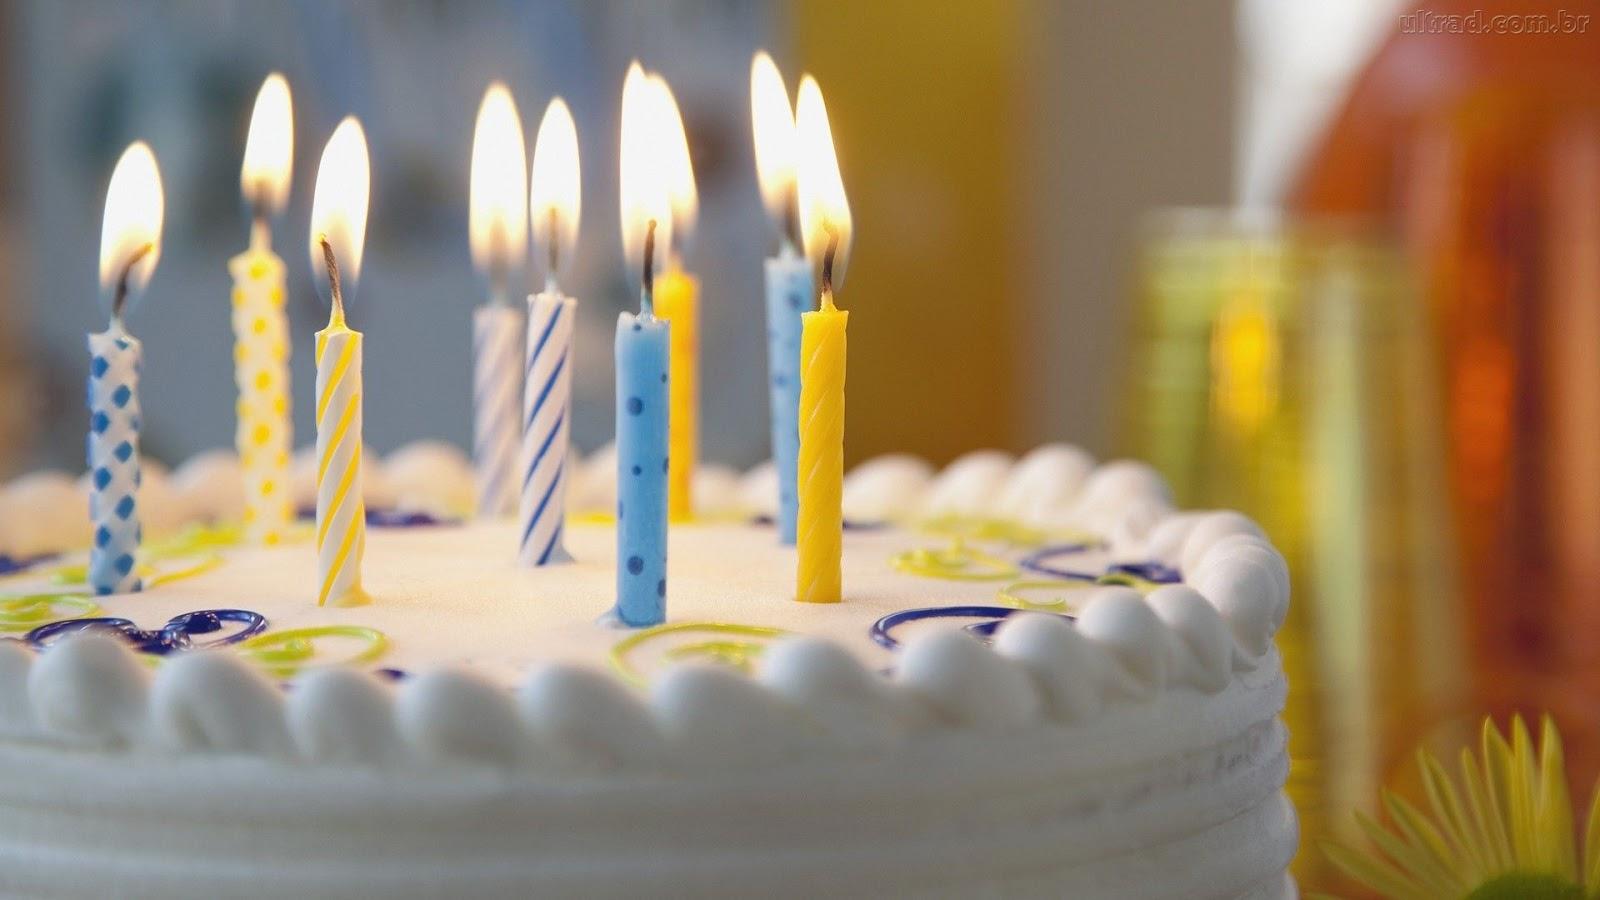 professora michelle 10 tradições de aniversário interessantes